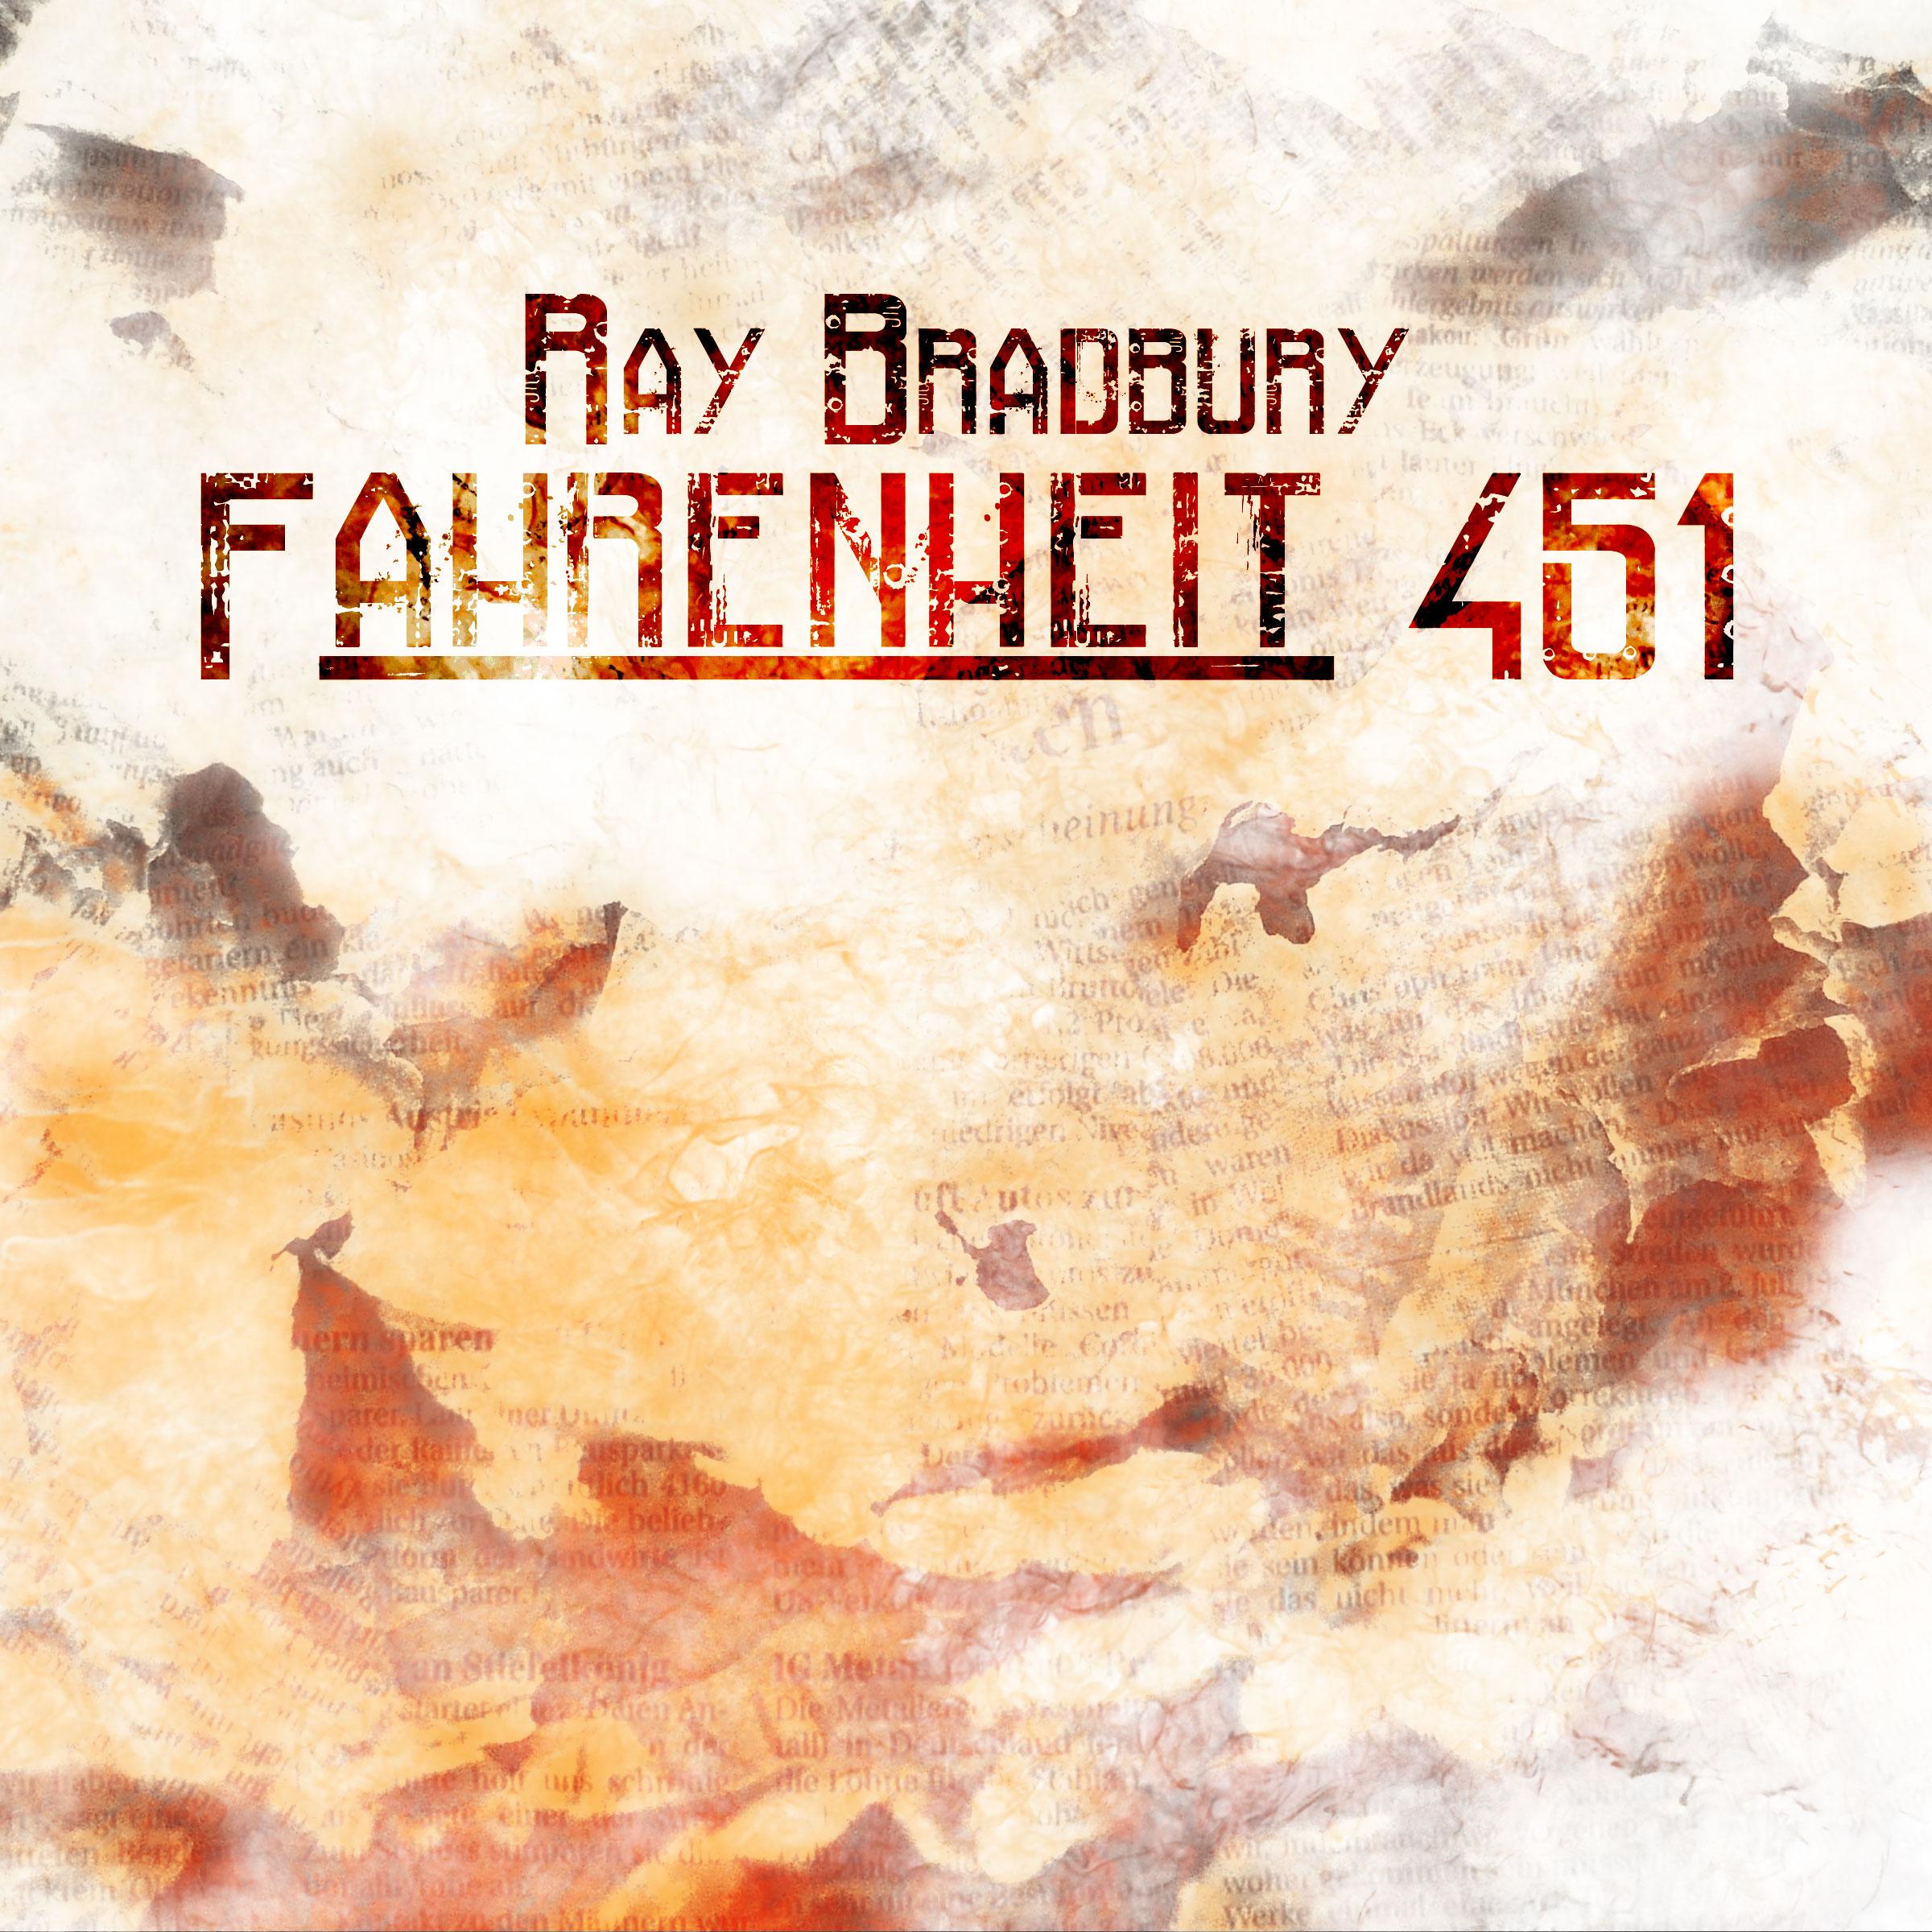 ADBLCRE-3712-Create-Covers-Ray-Bradbury-F-451-V2.jpg